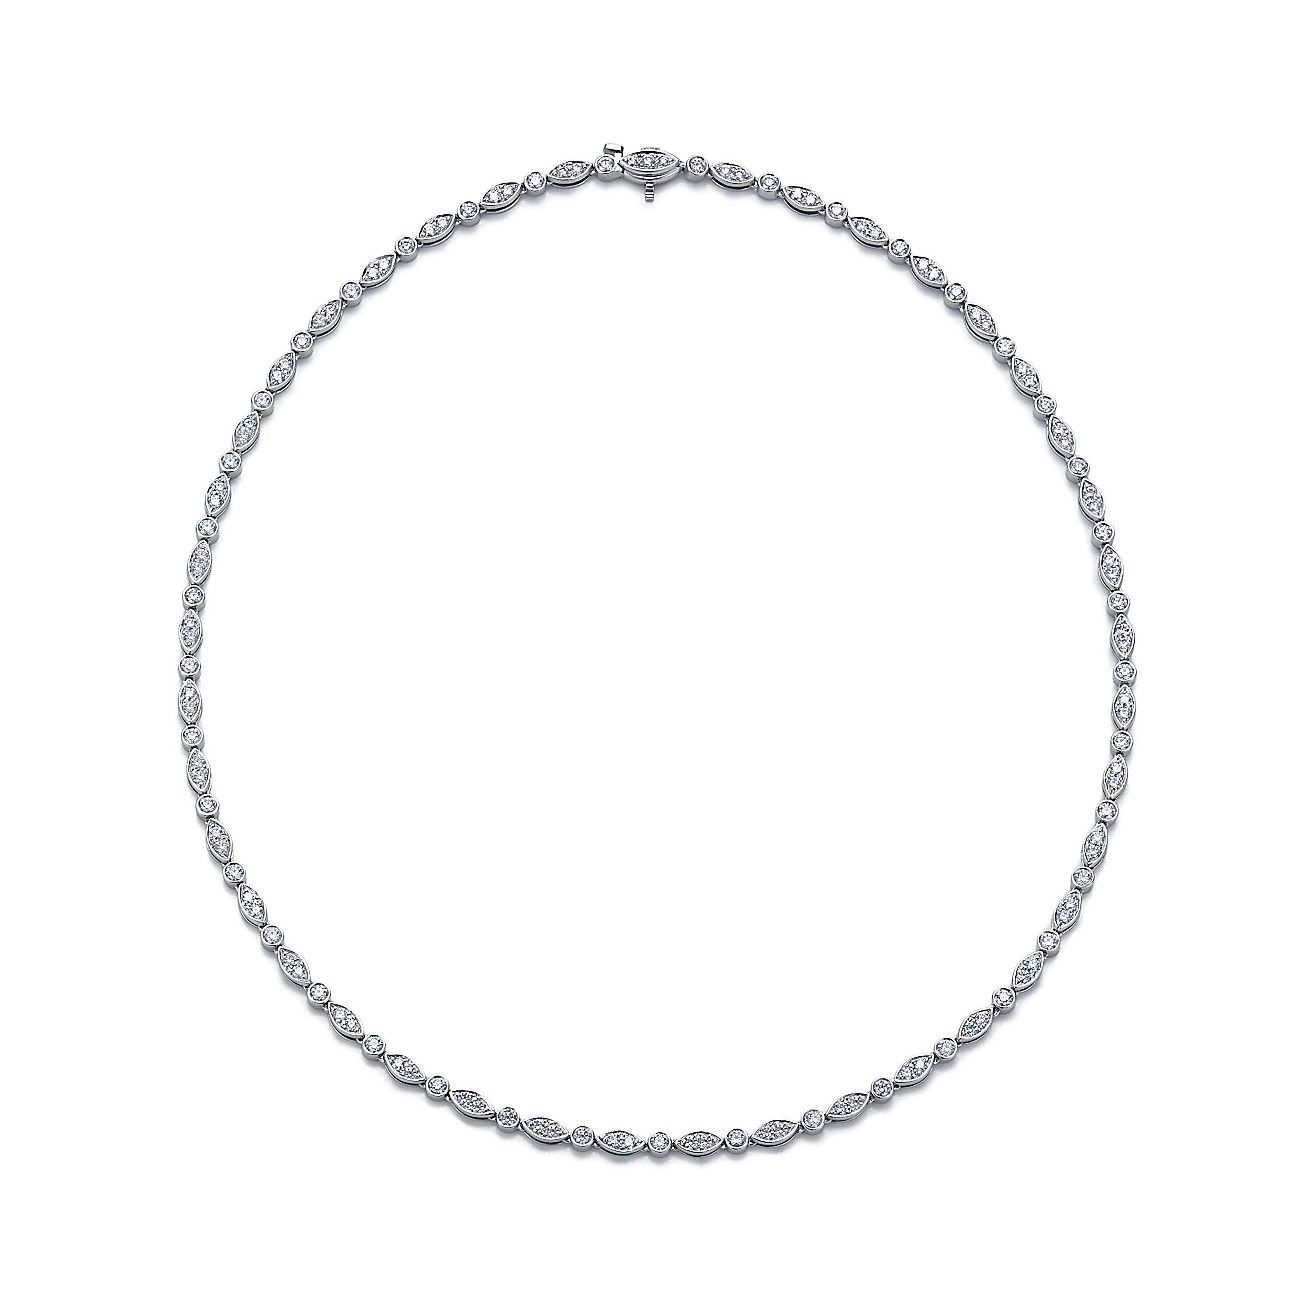 Tiffany Jazz™ necklace in platinum with round brilliant